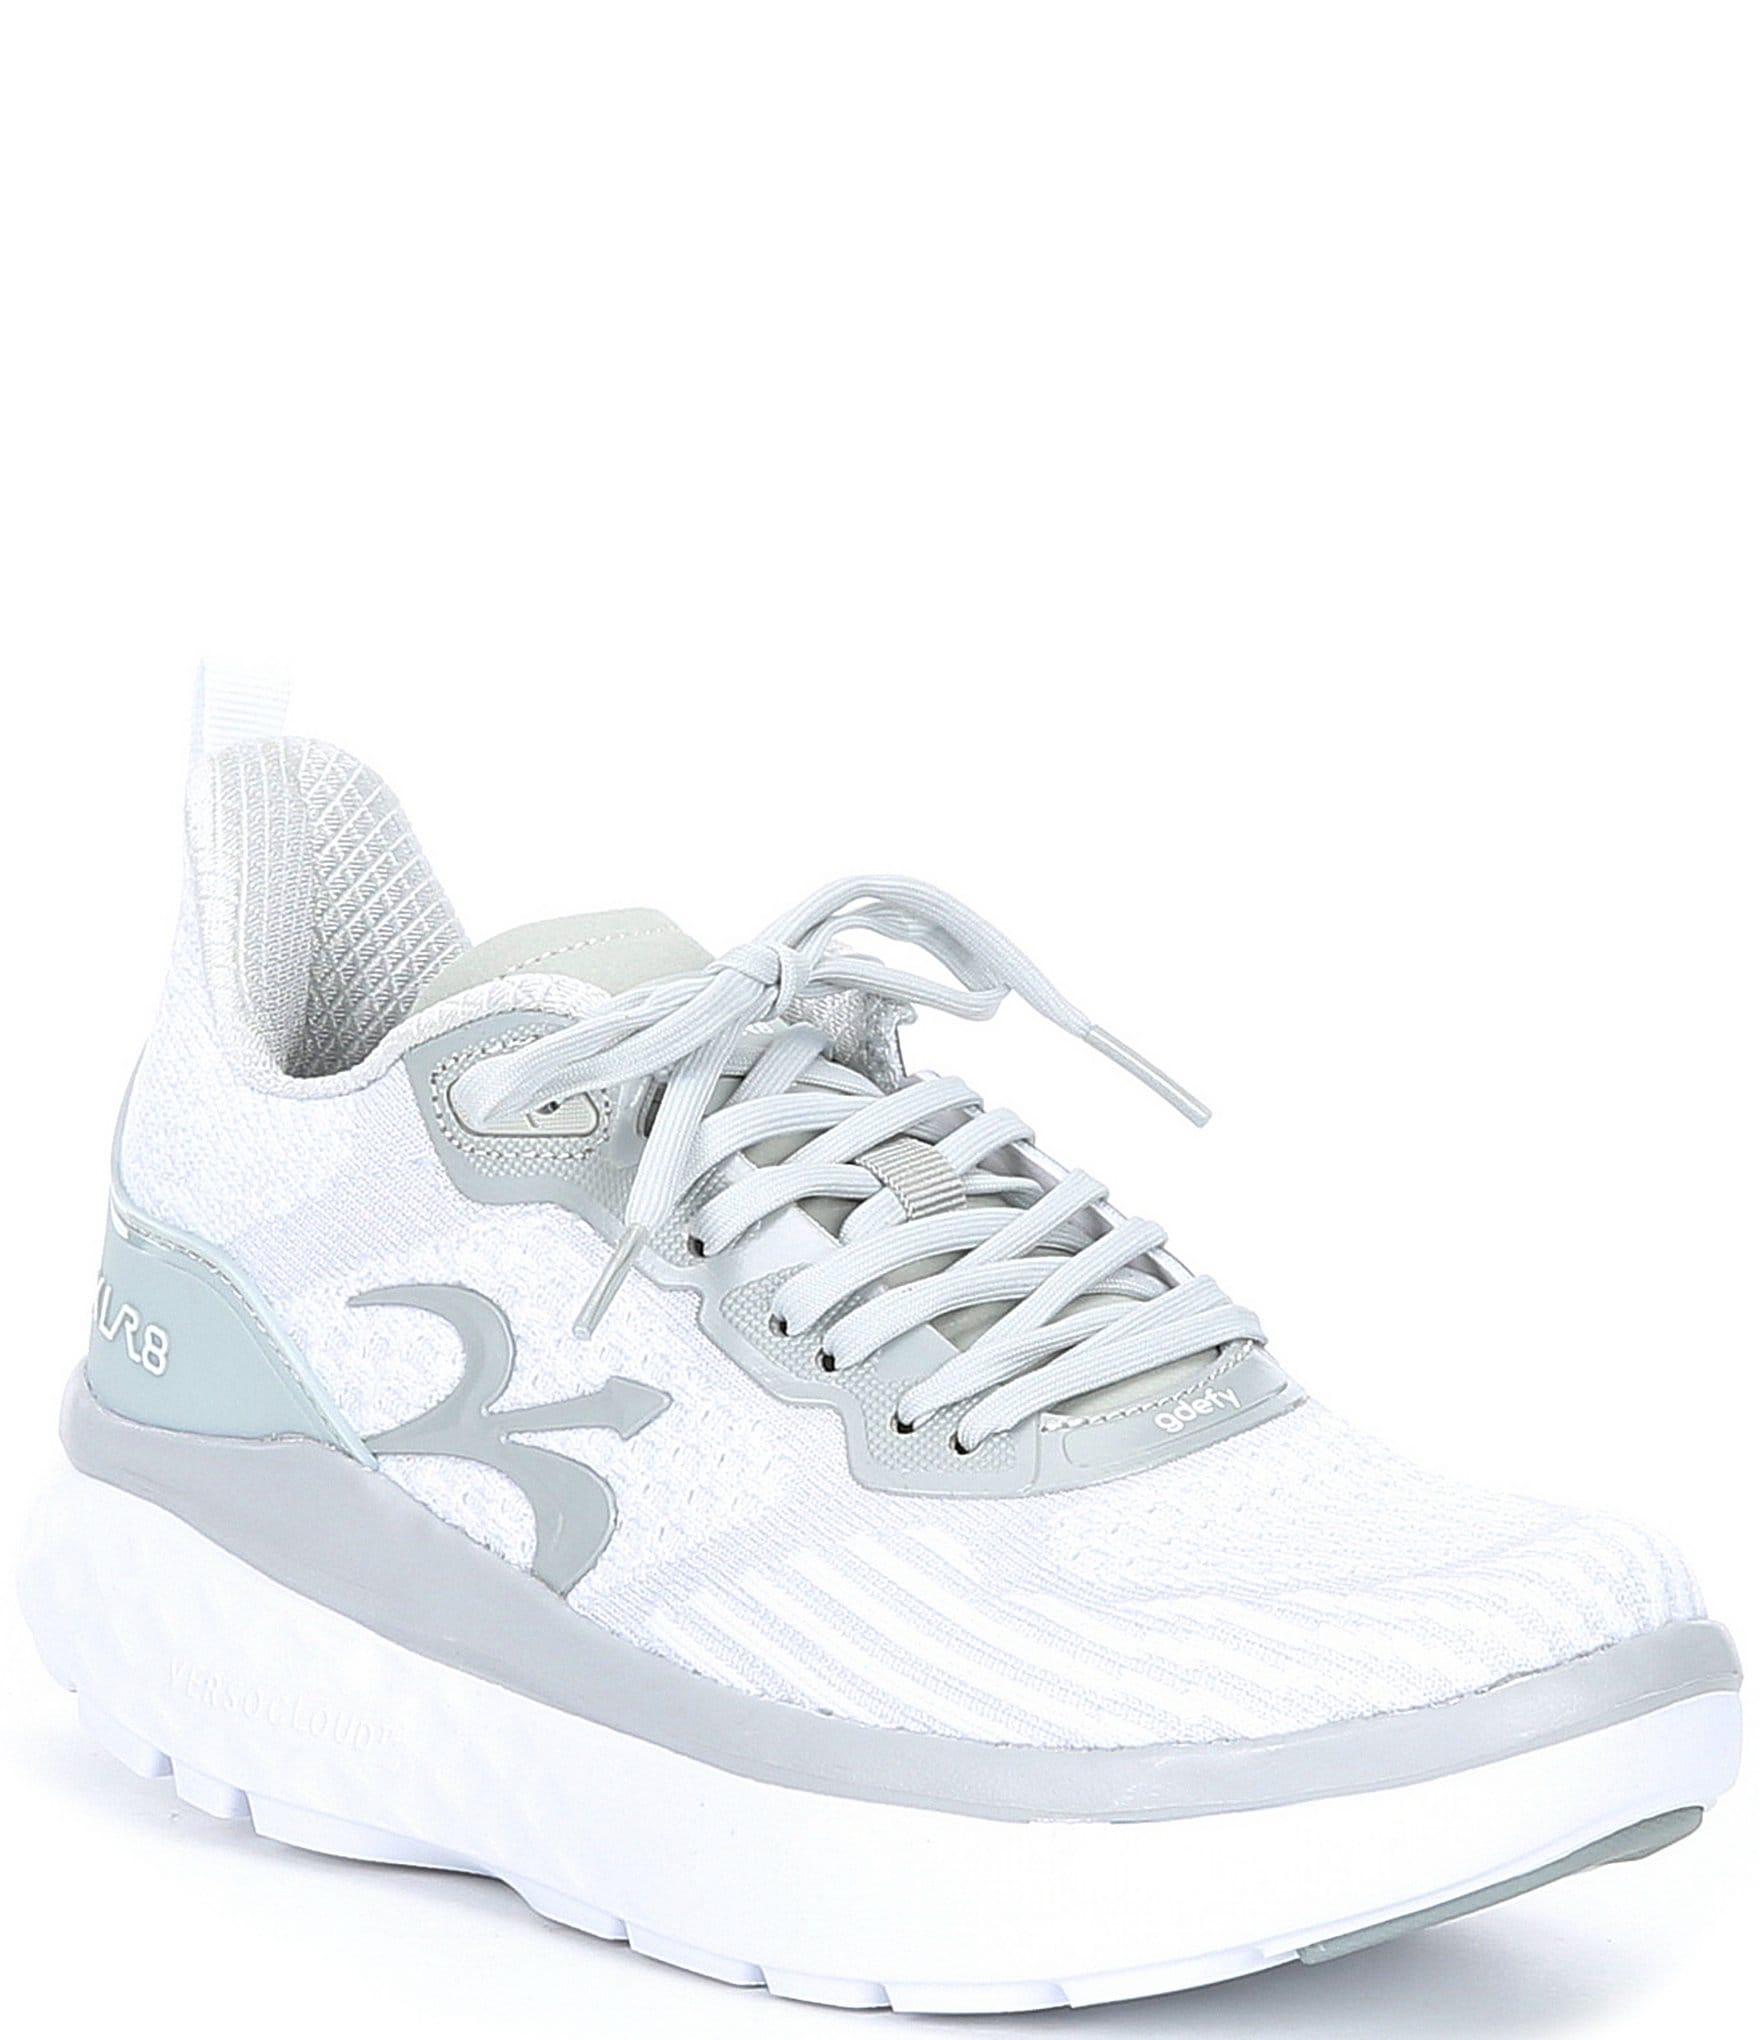 Women's Running Shoes | Dillard's